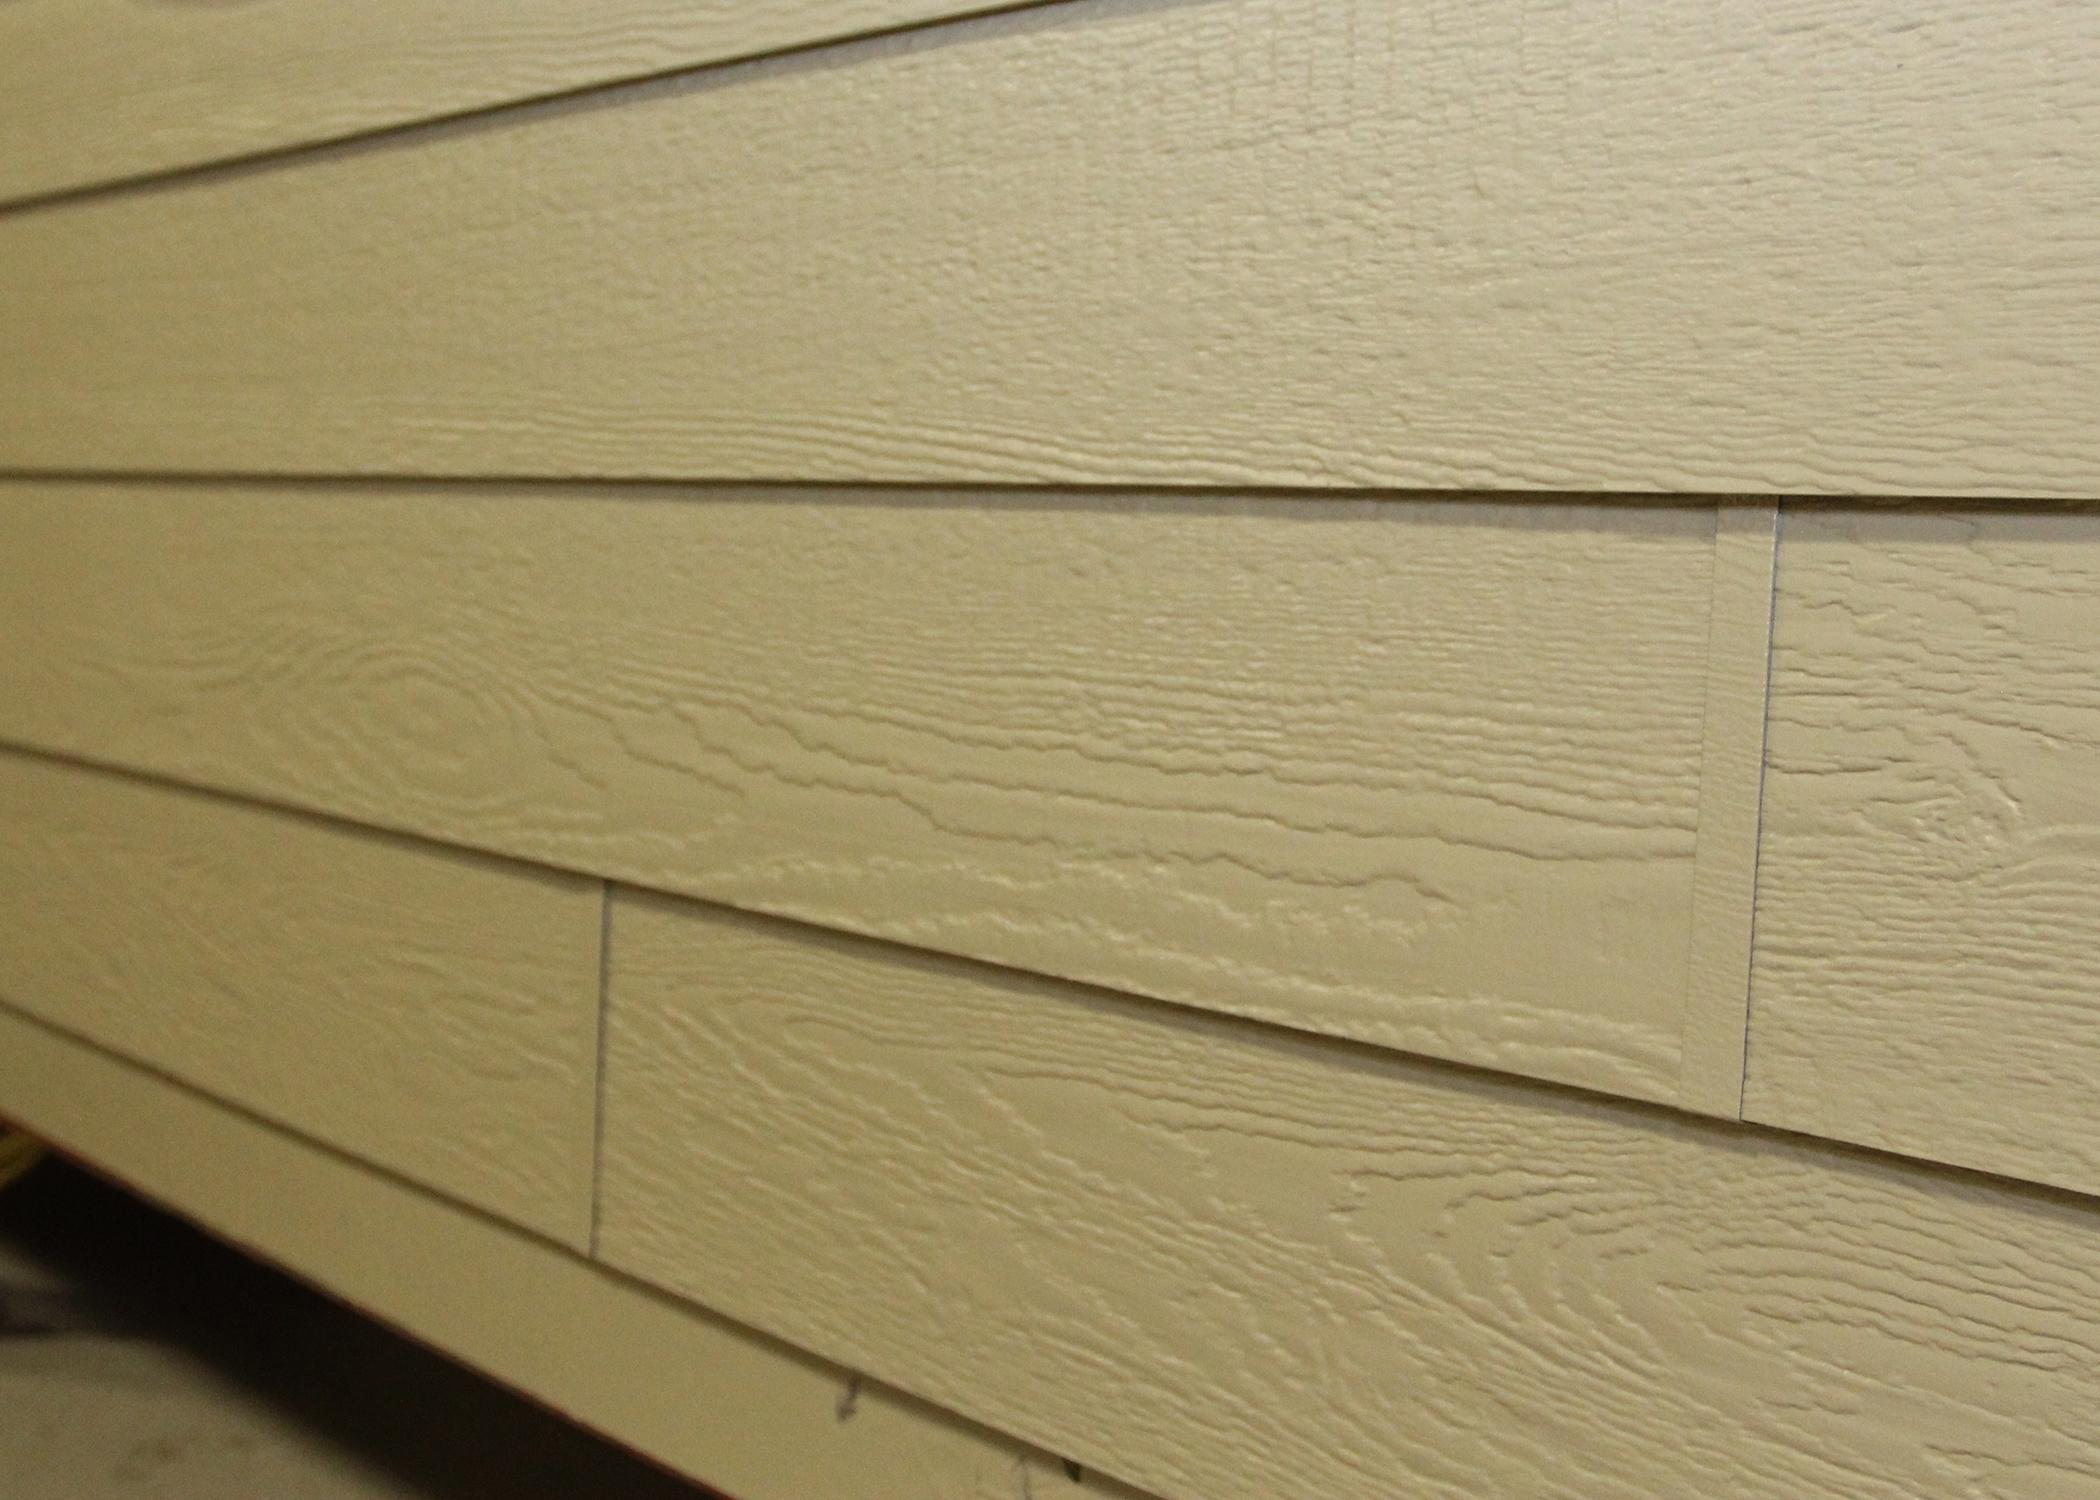 Painting Vinyl Siding To Look Like Wood Madison Art Center